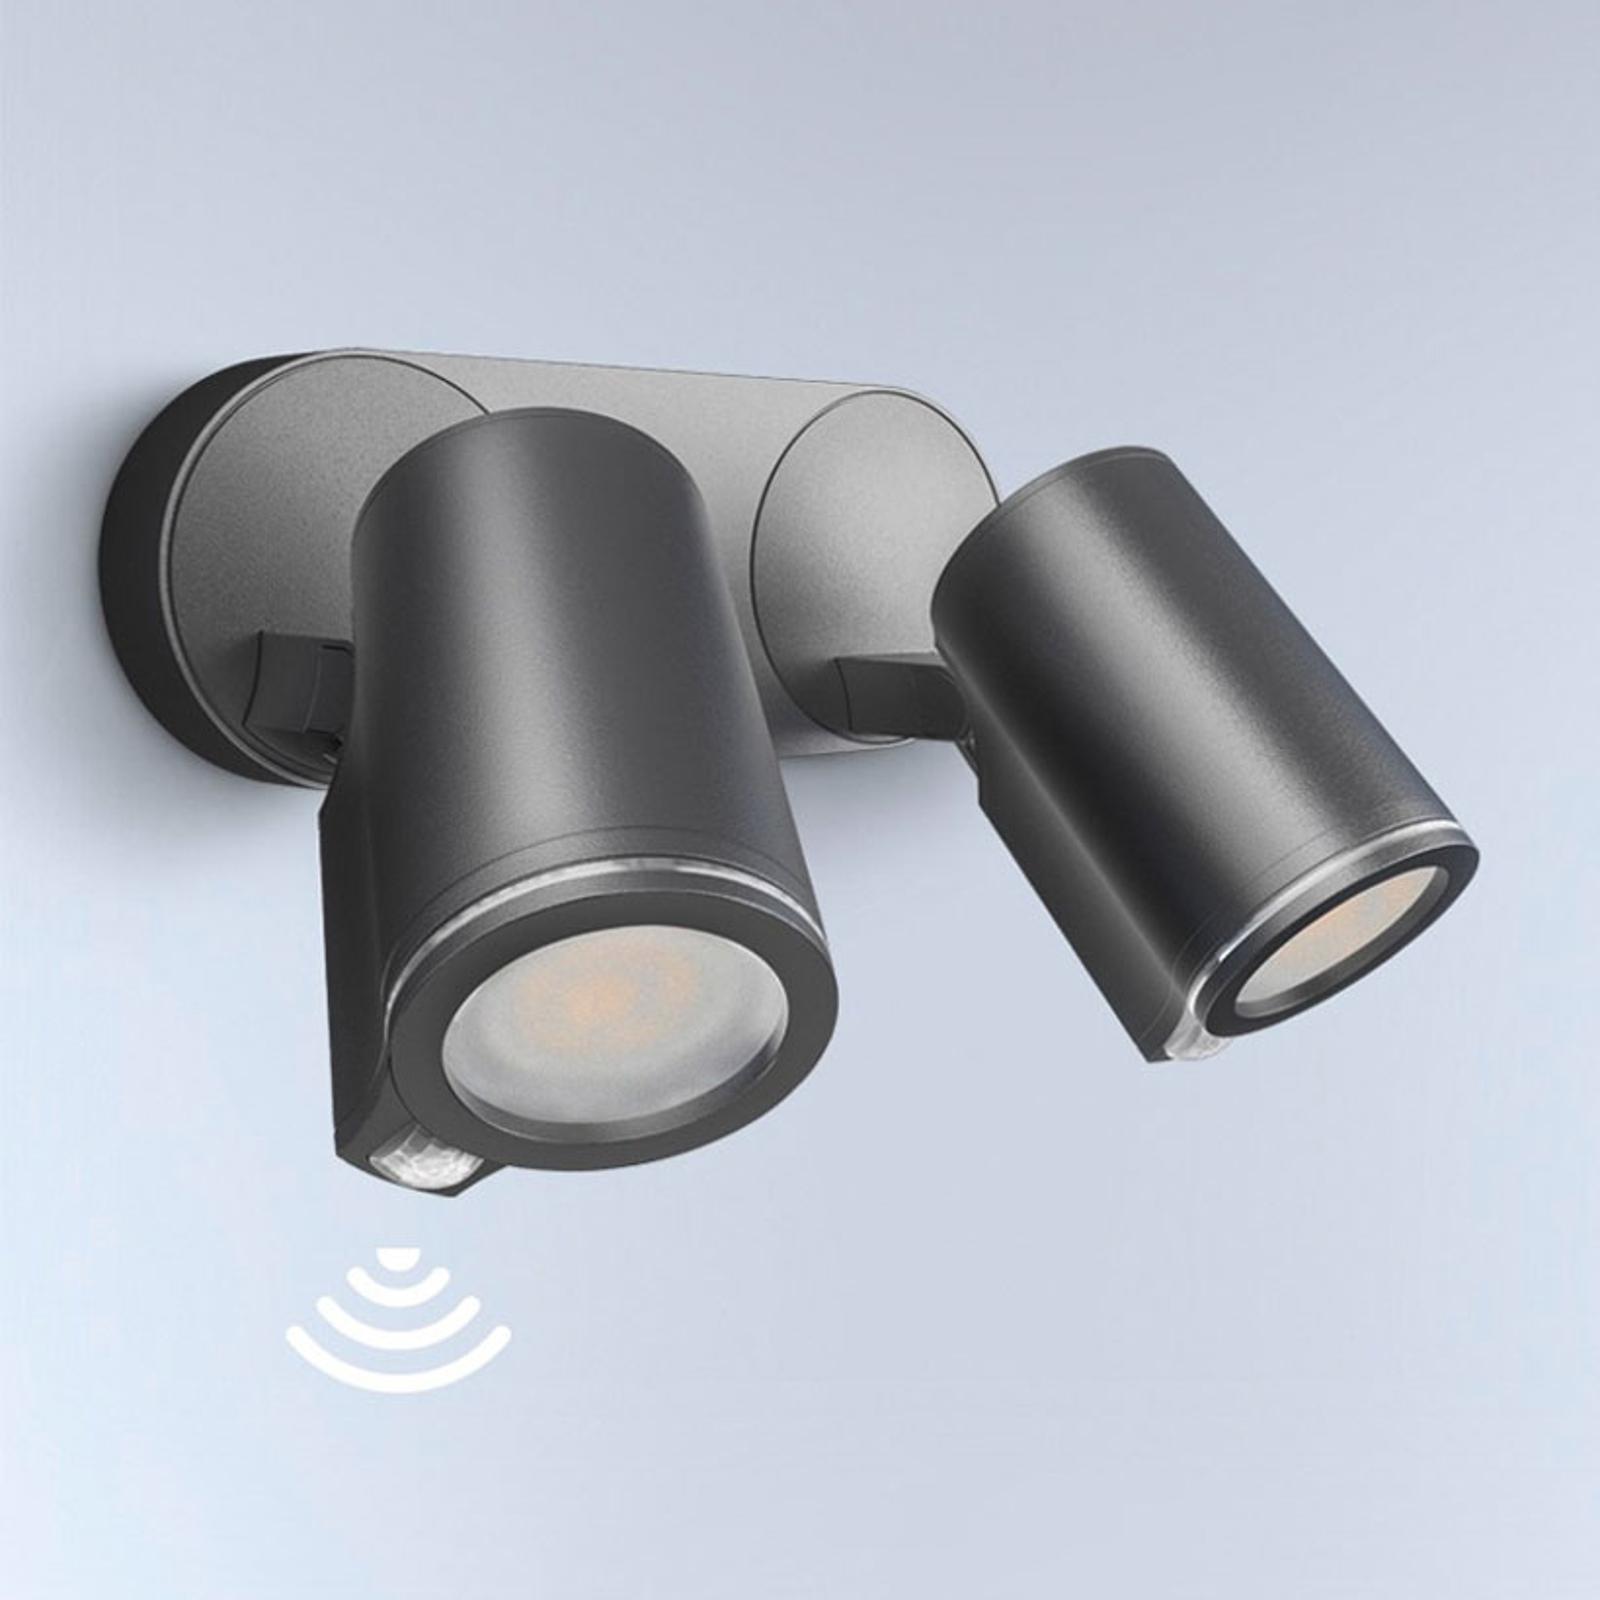 STEINEL Spot Duo Sensor LED-Strahler zweiflammig